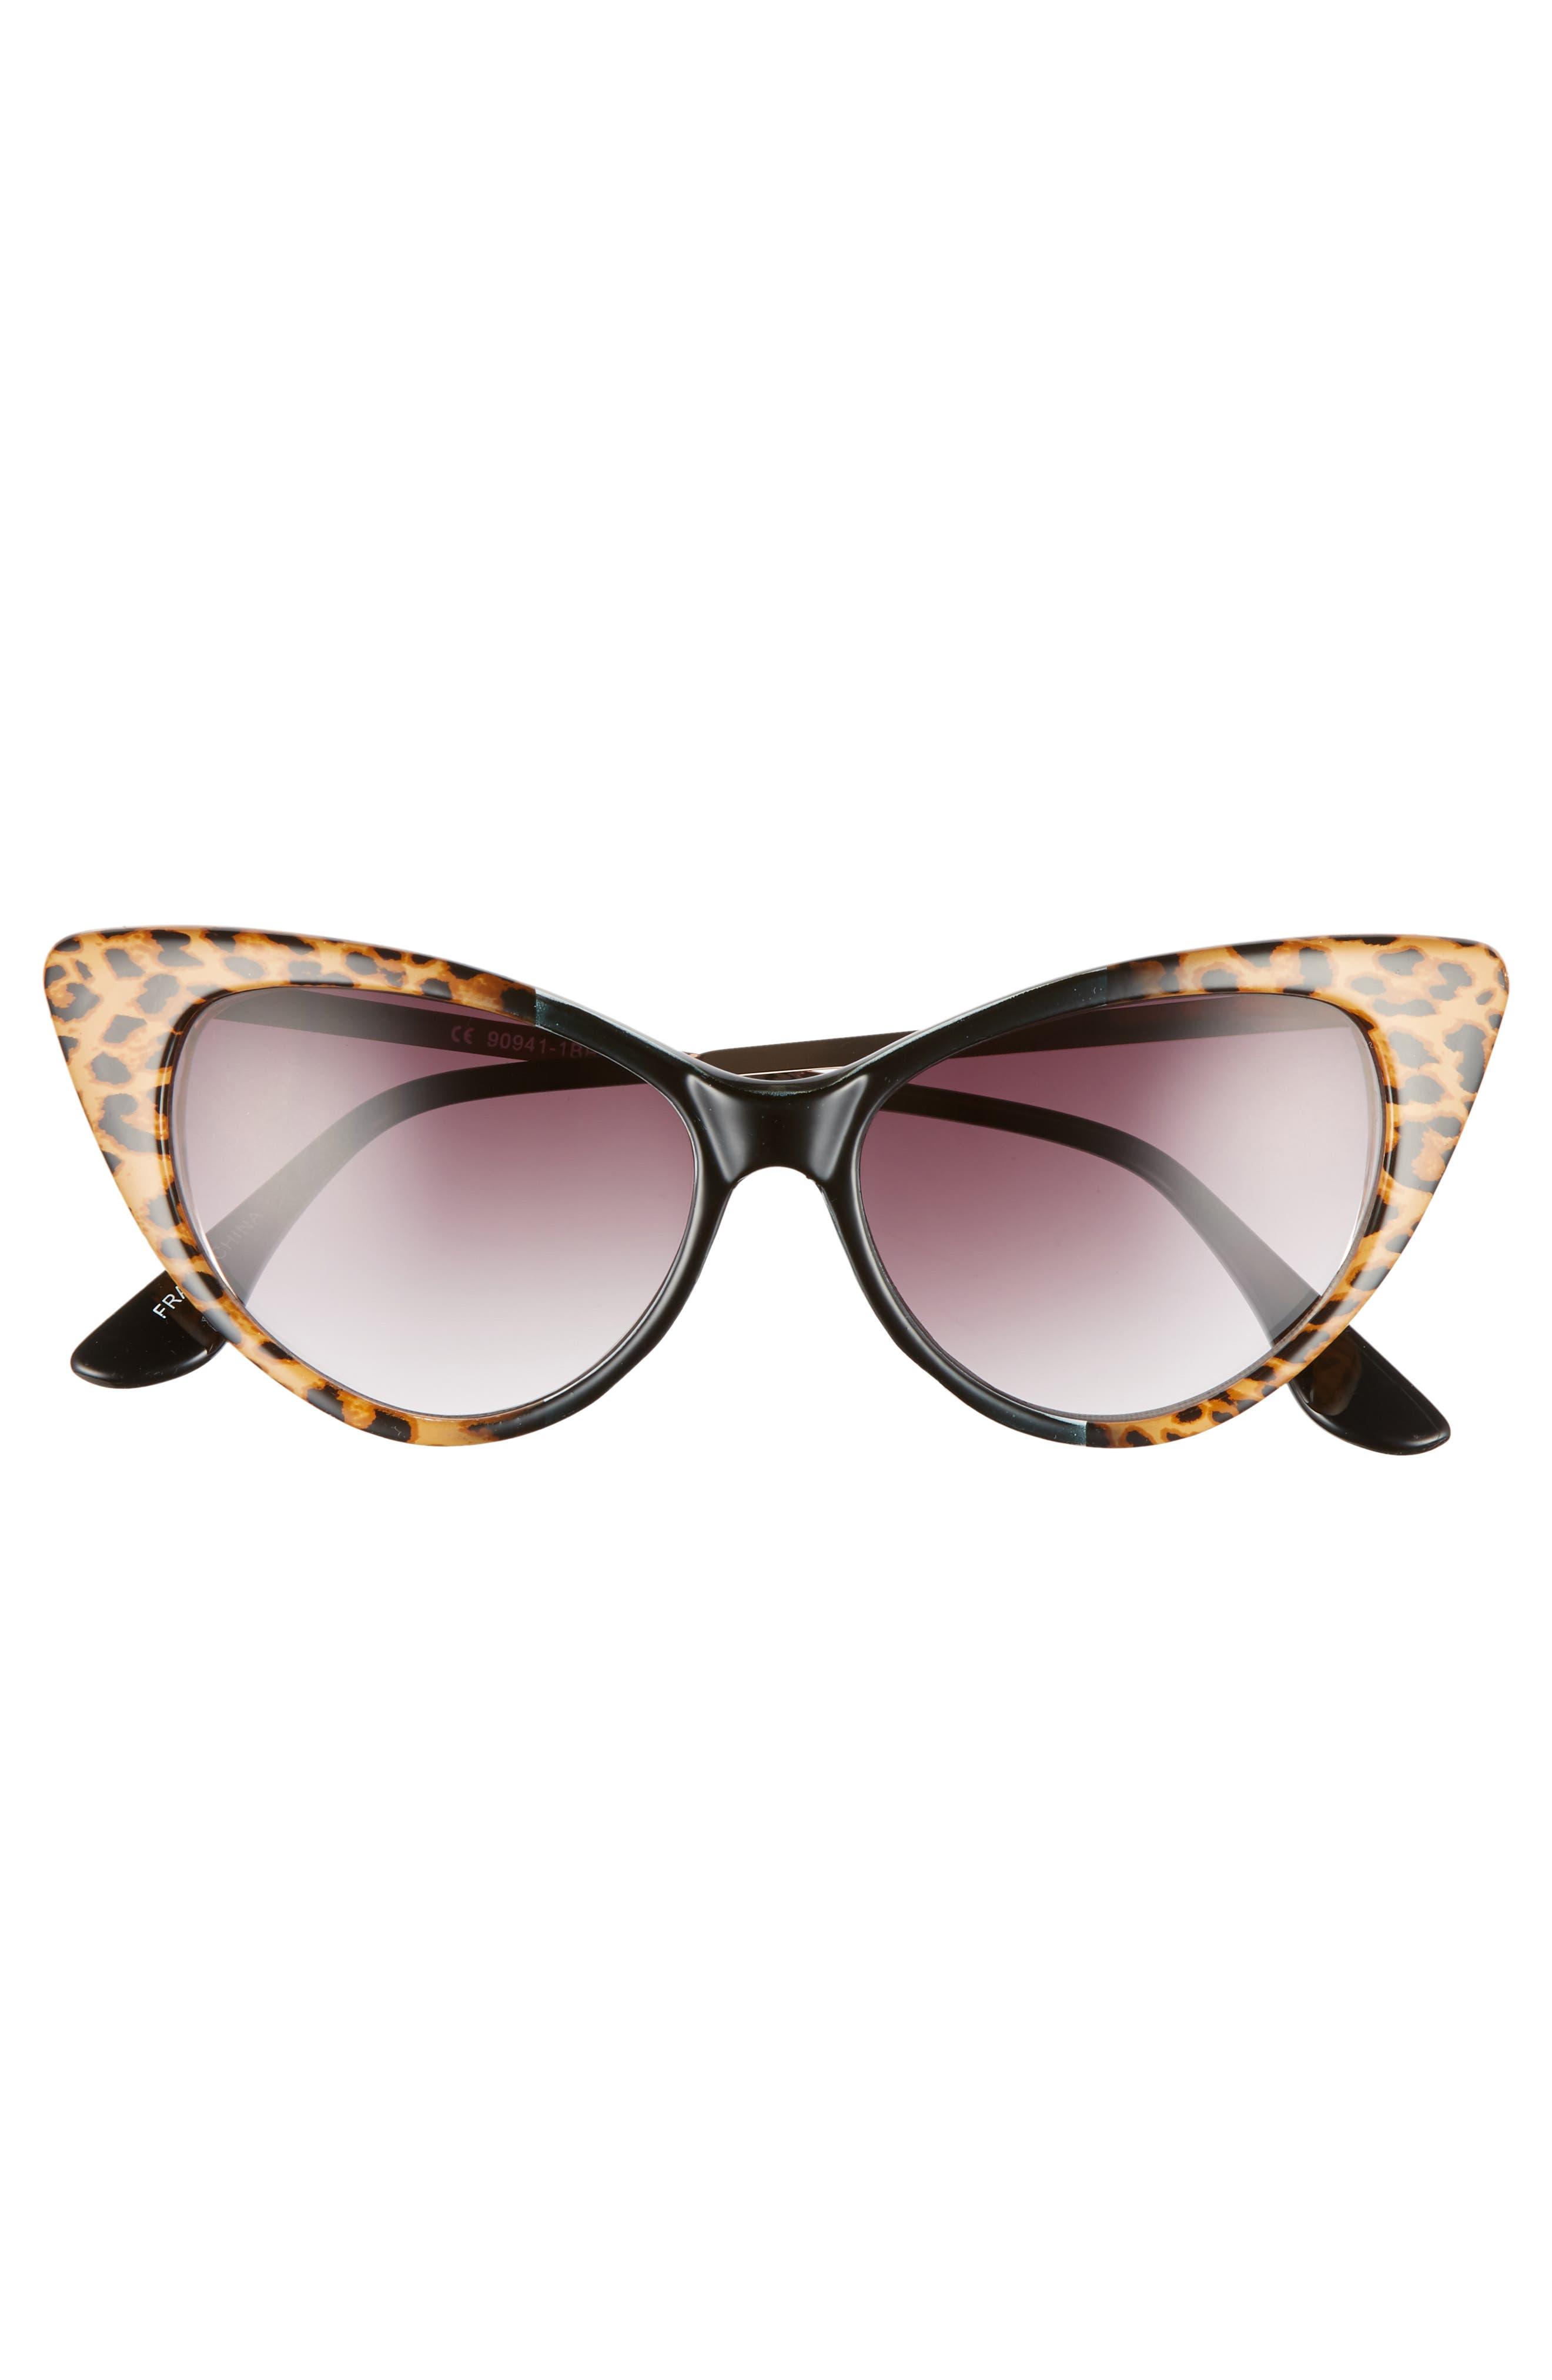 62mm Leopard Print Cat Eye Sunglasses,                             Alternate thumbnail 3, color,                             Leopard/ Black